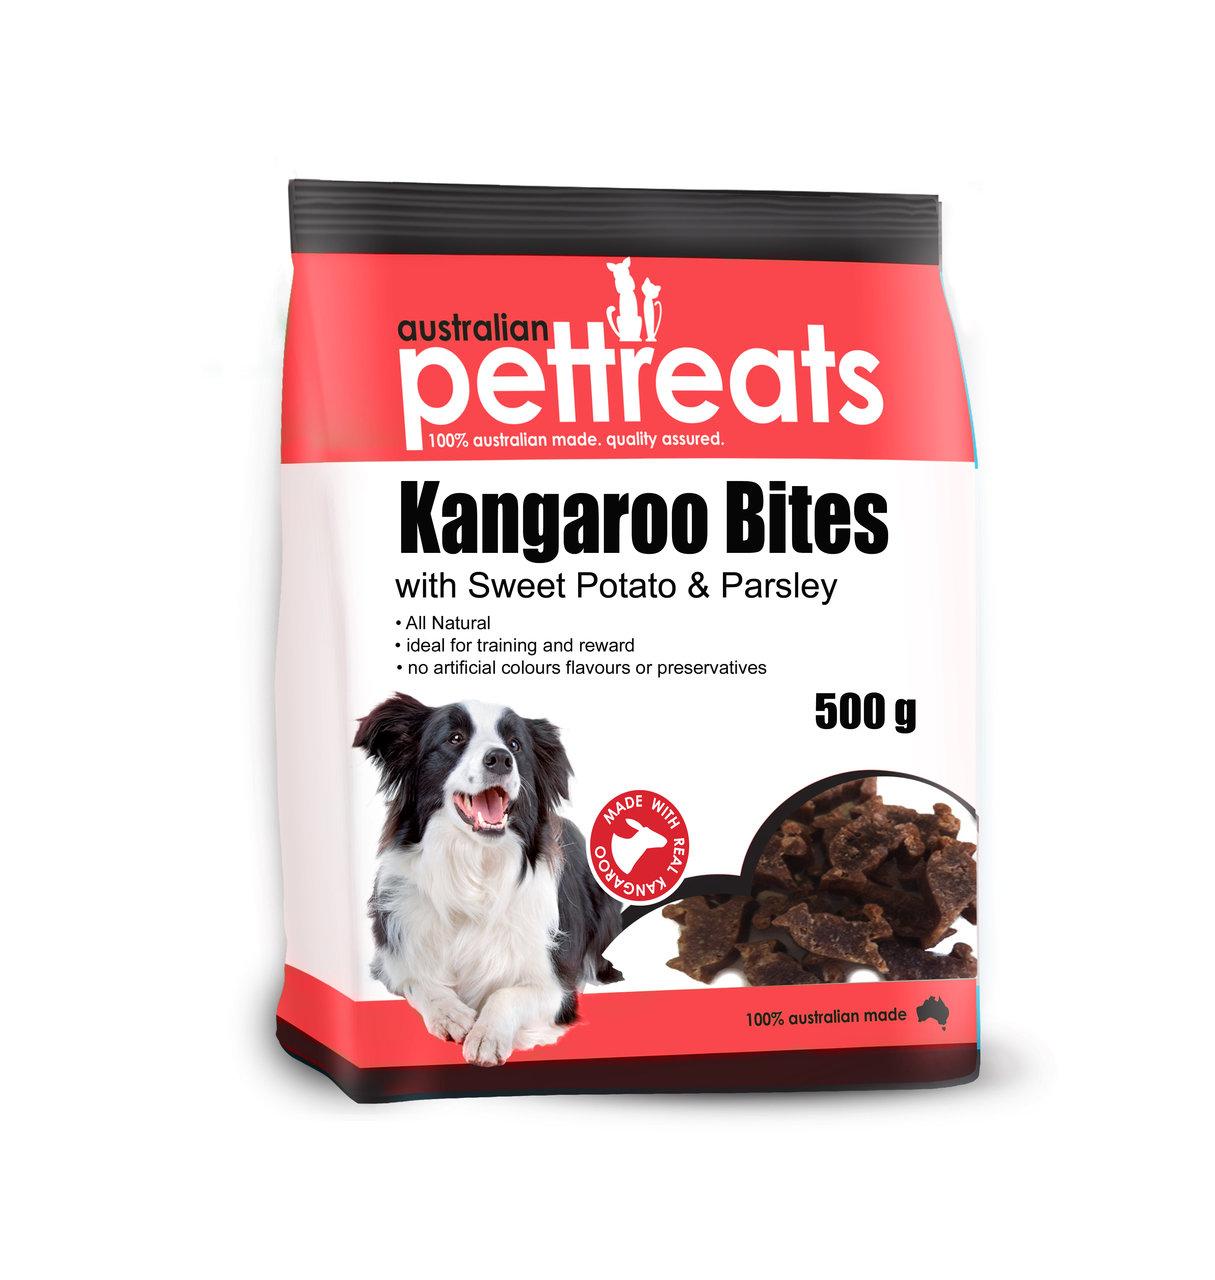 Kangaroo Bites / Straps with Sweet Potato and Parsley